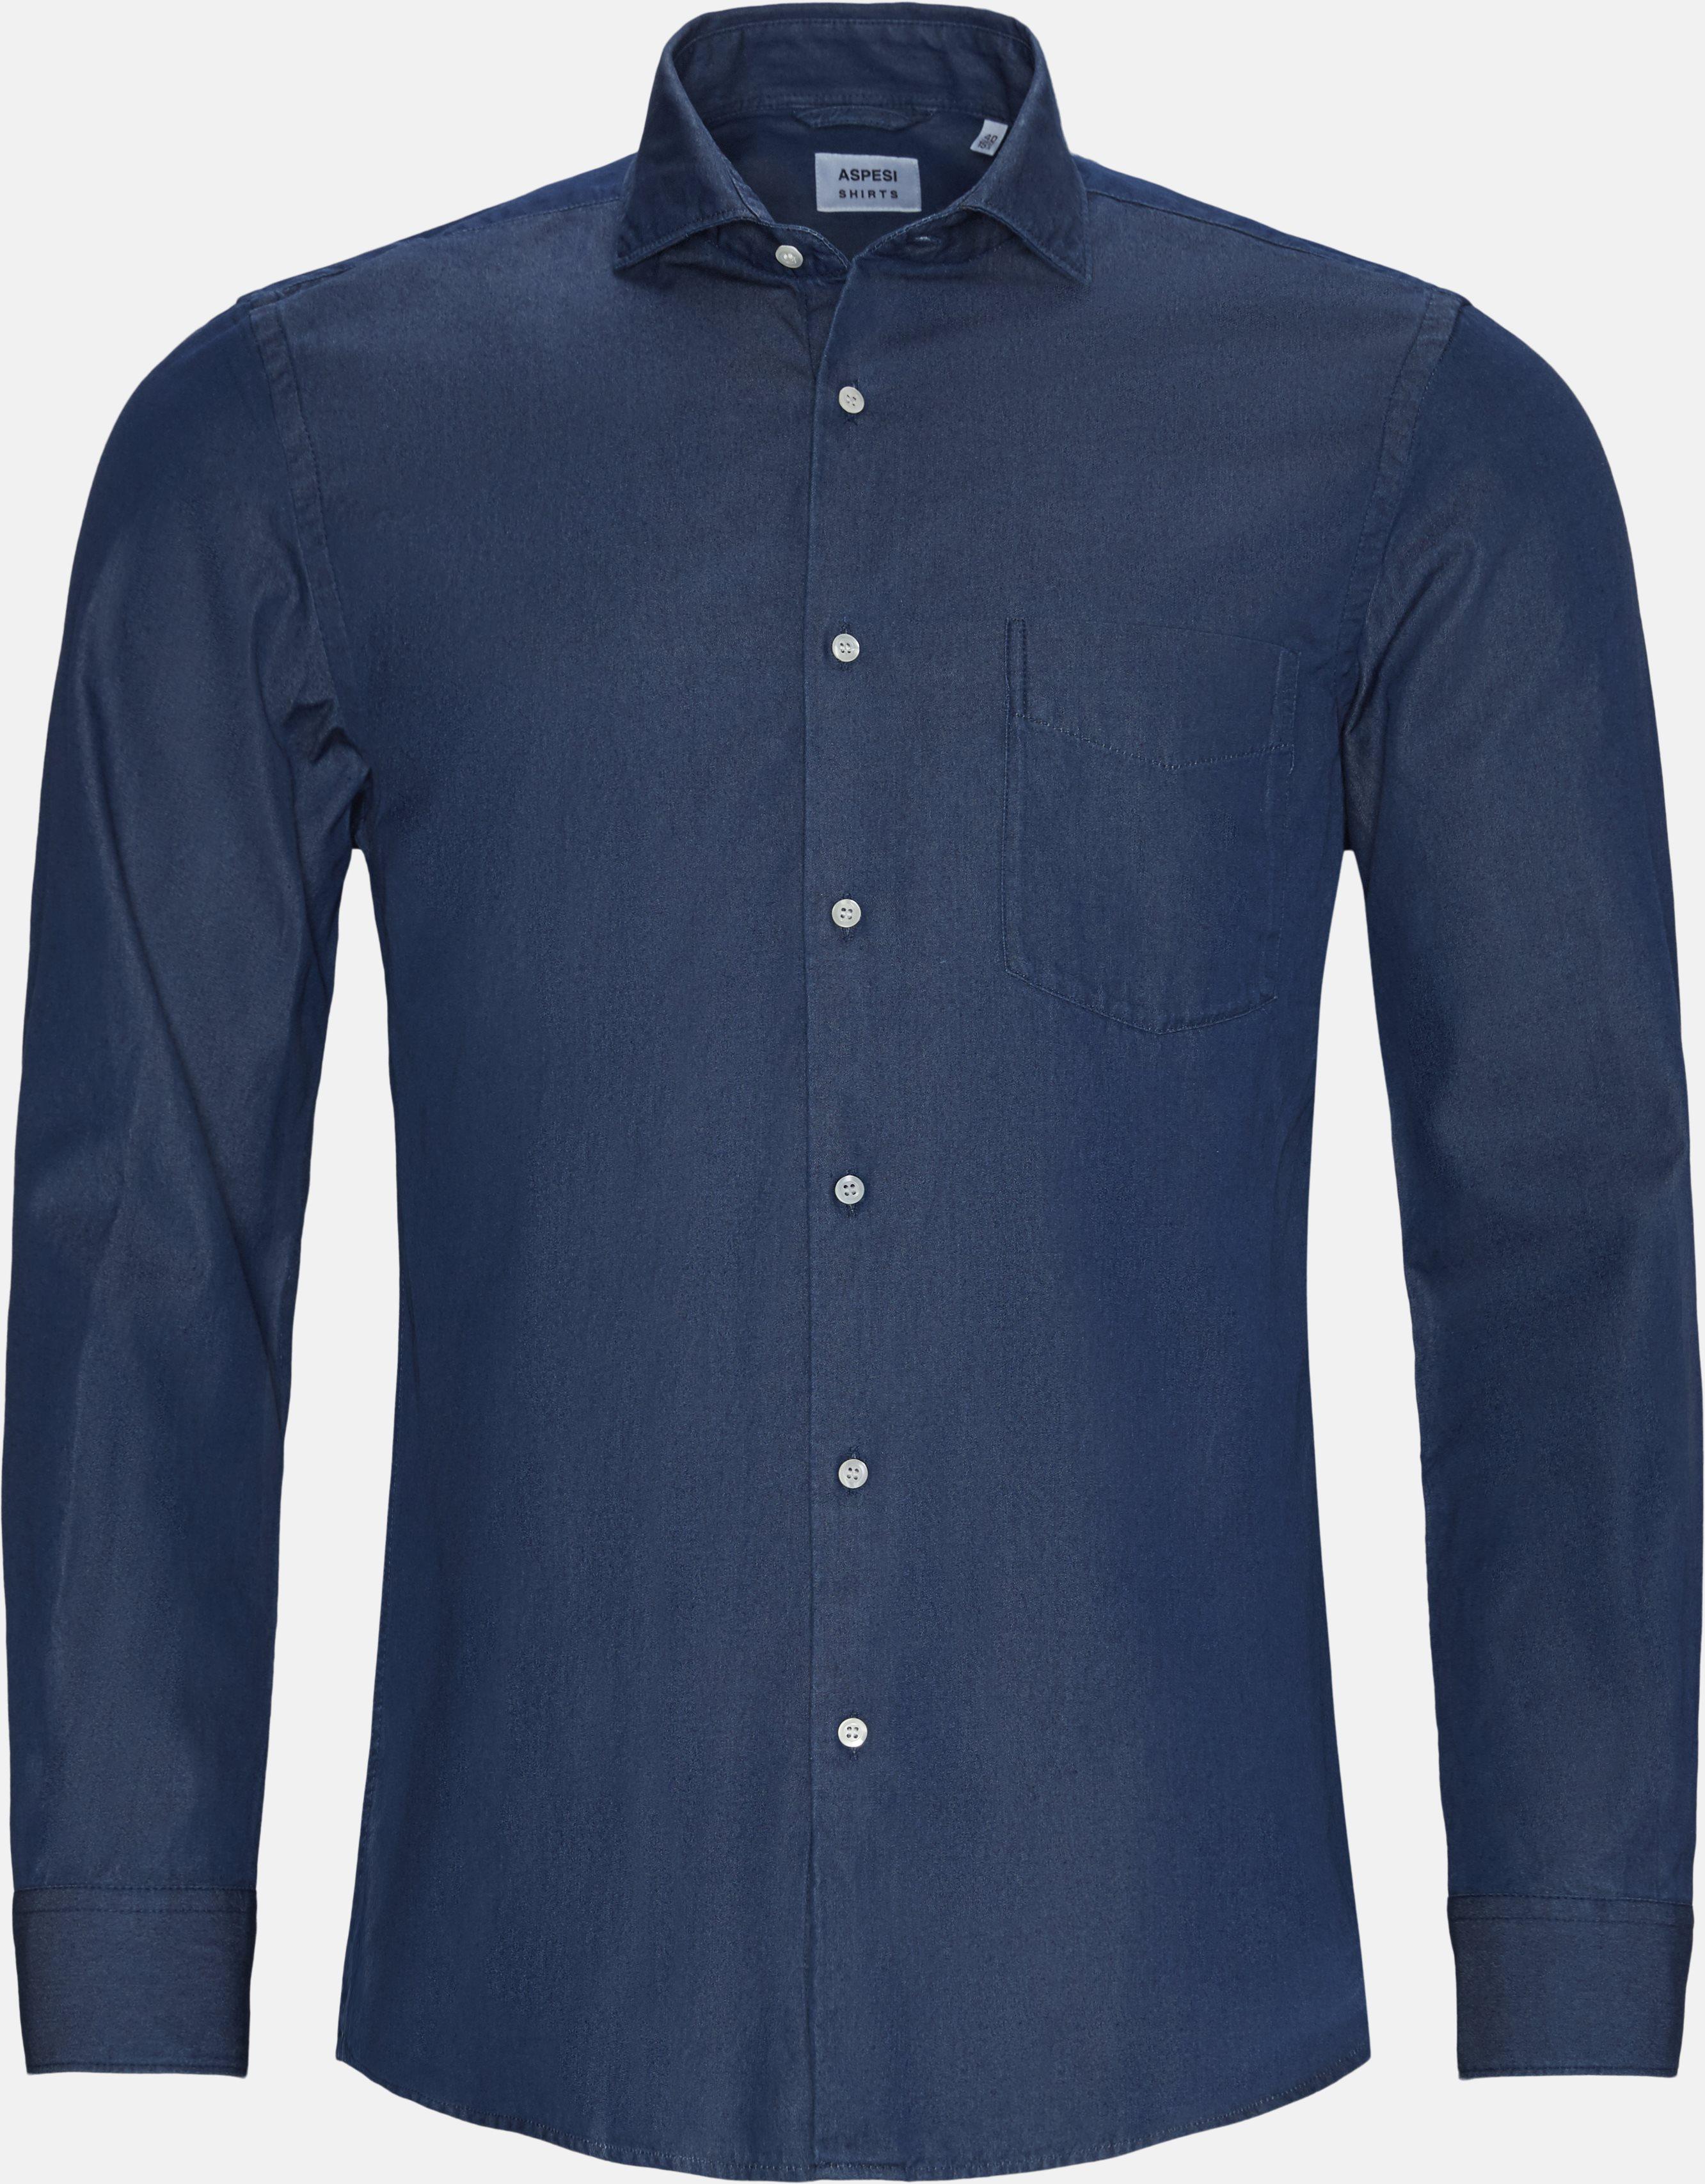 Skjorter - Regular fit - Denim